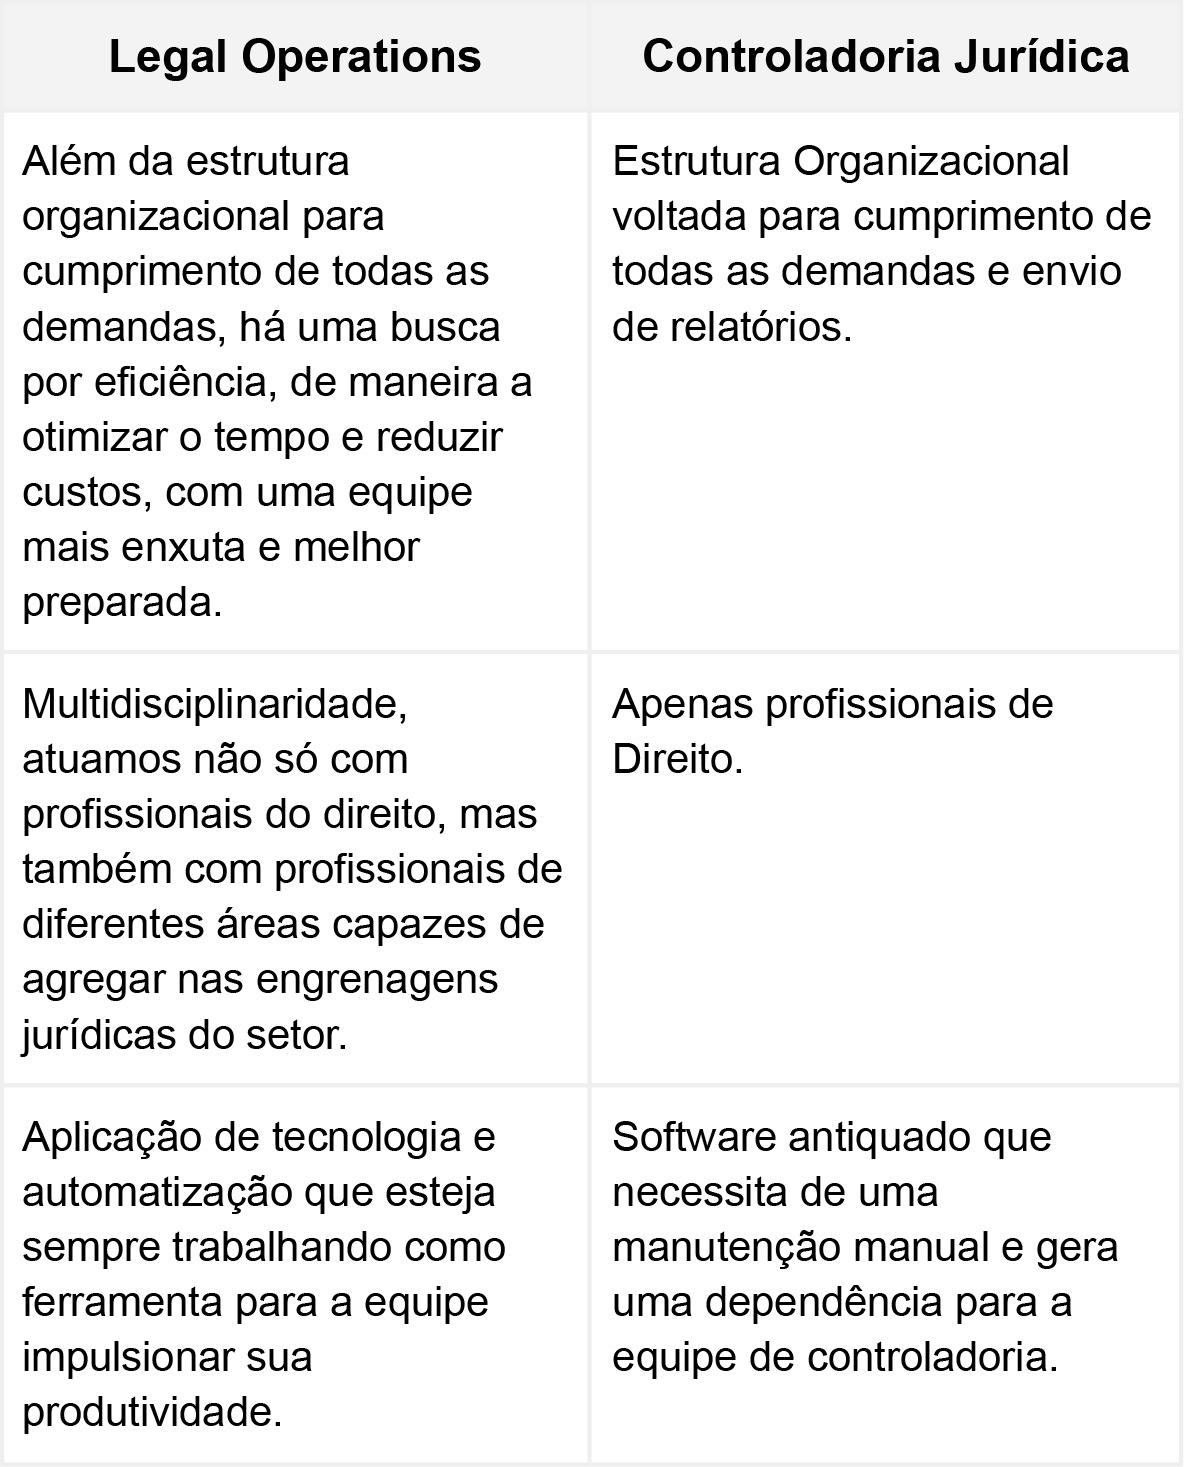 tabela comparativa entre legal operations e controladoria juridica